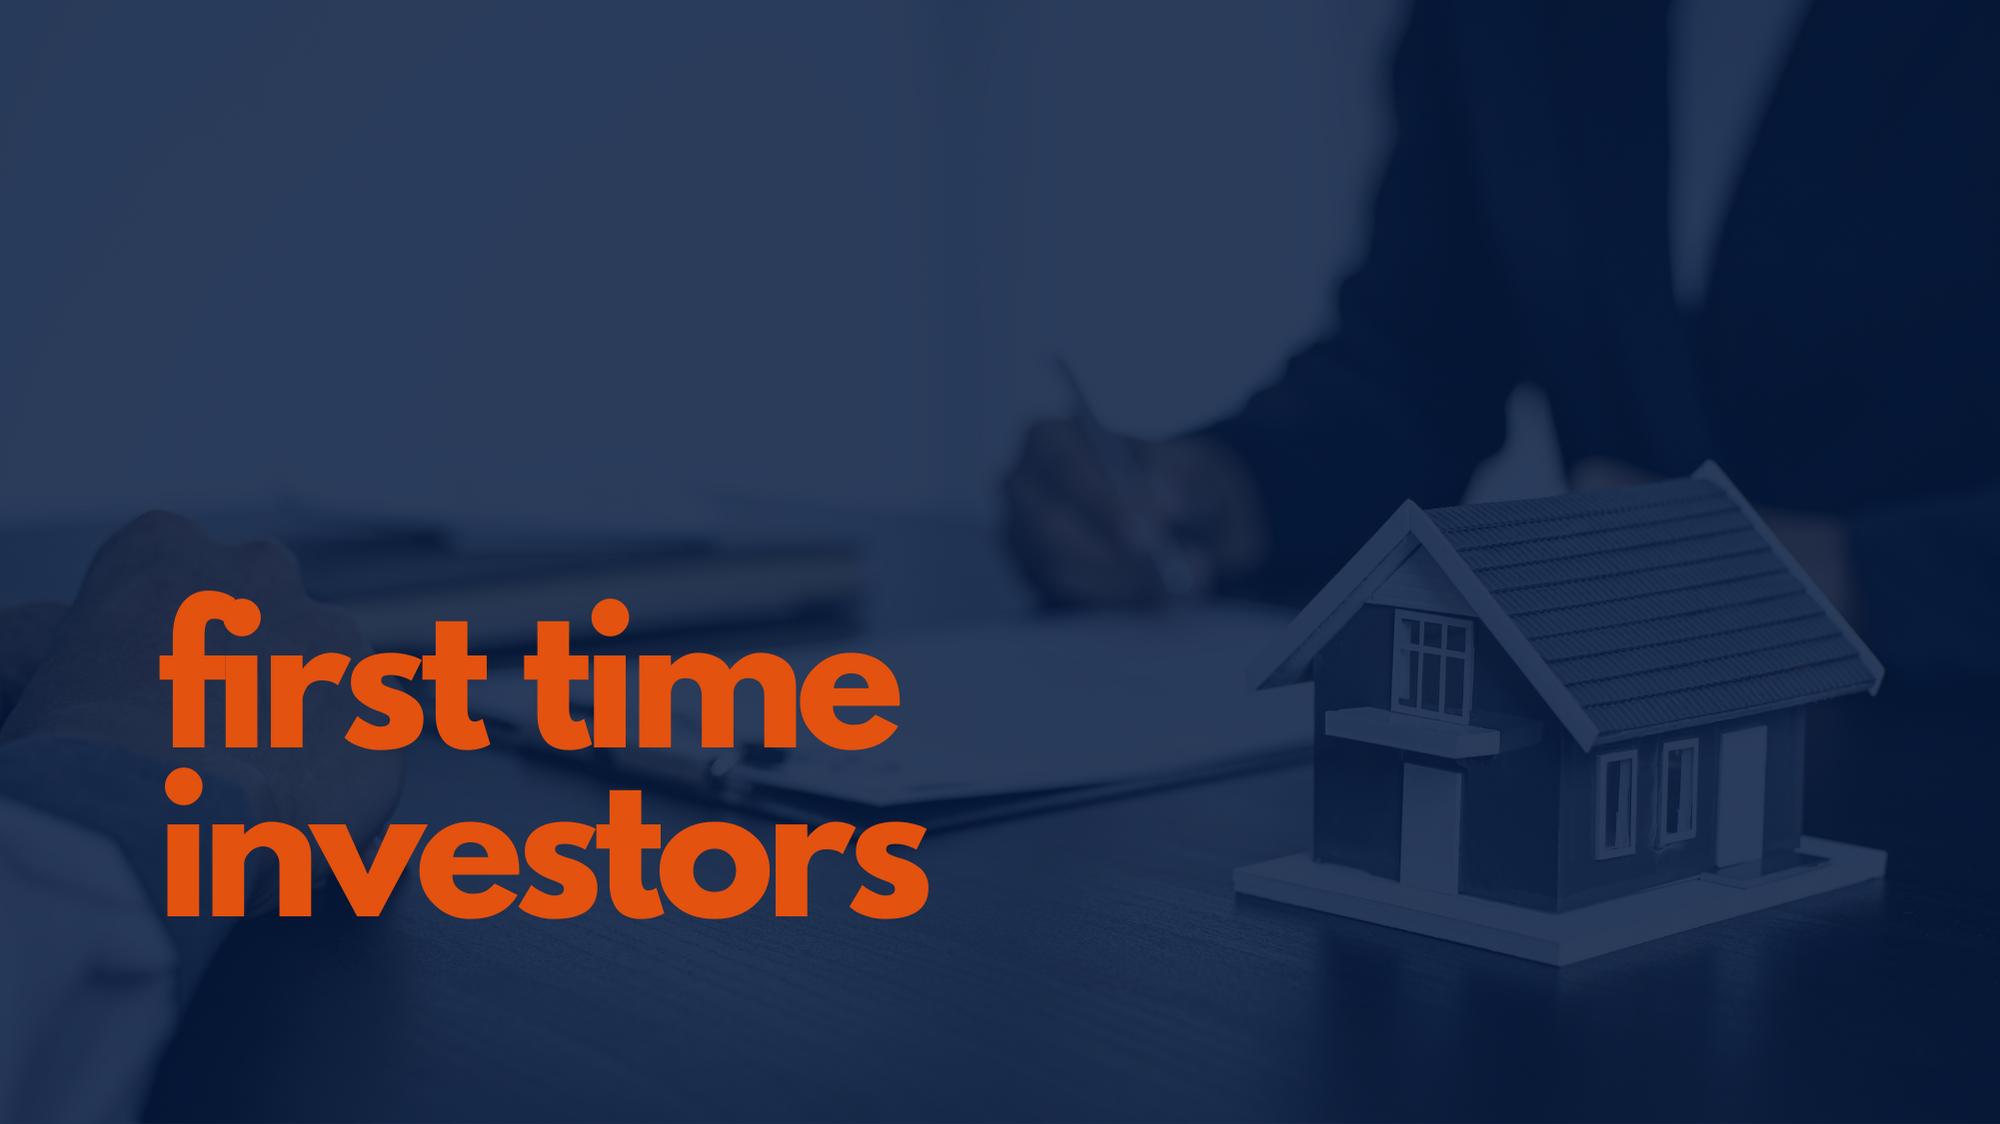 1st time investors